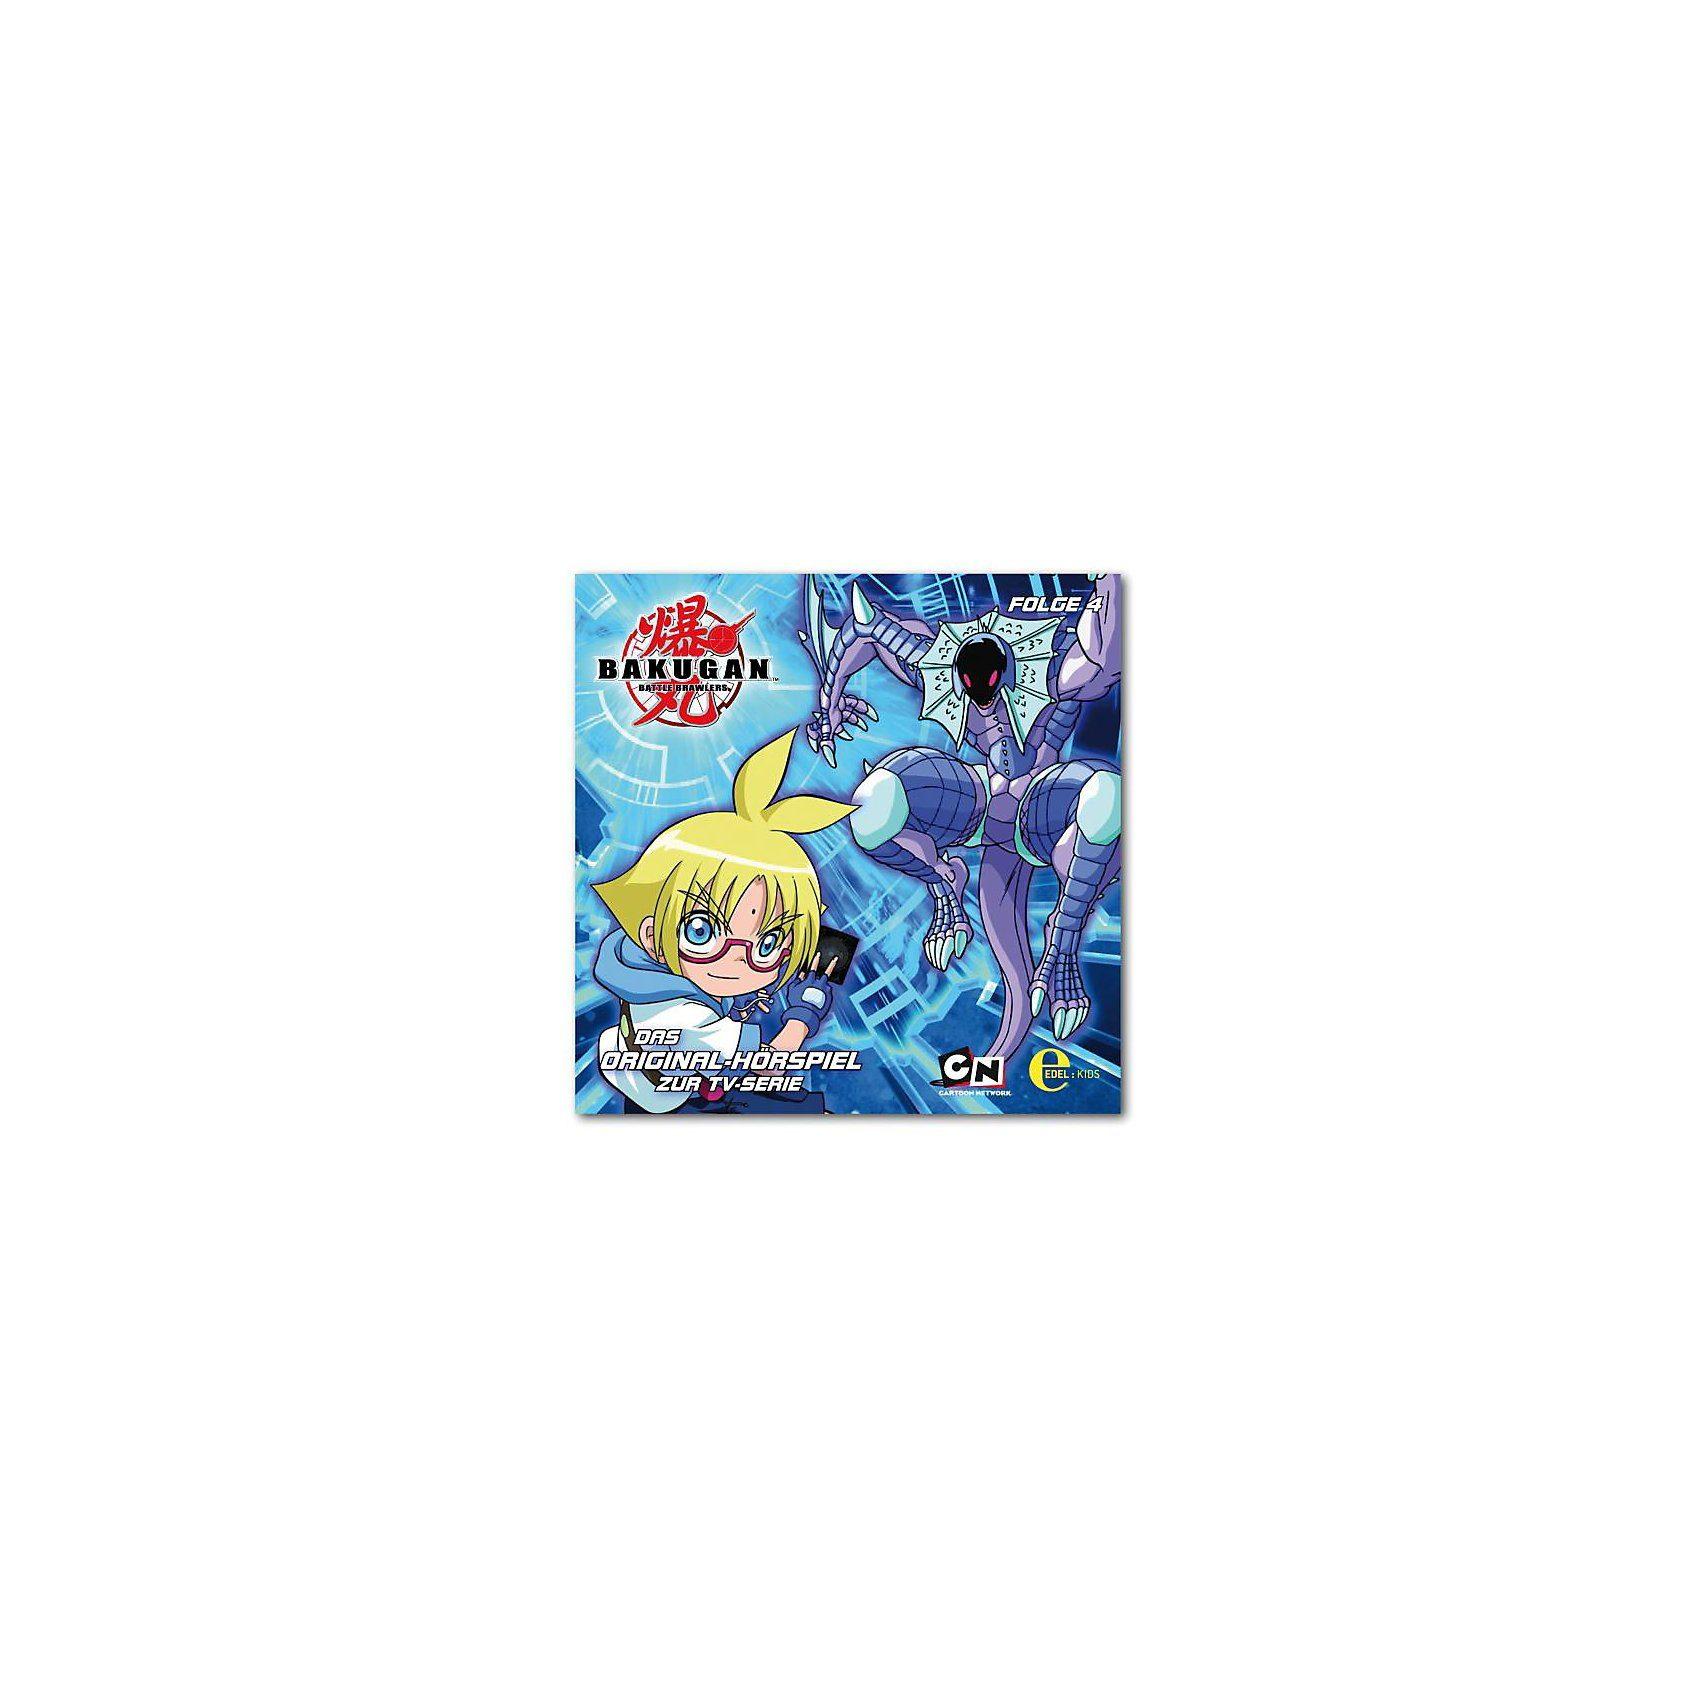 Edel Germany GmbH CD Bakugan - Spieler des Schicksals 04 Original - Hörspiel z